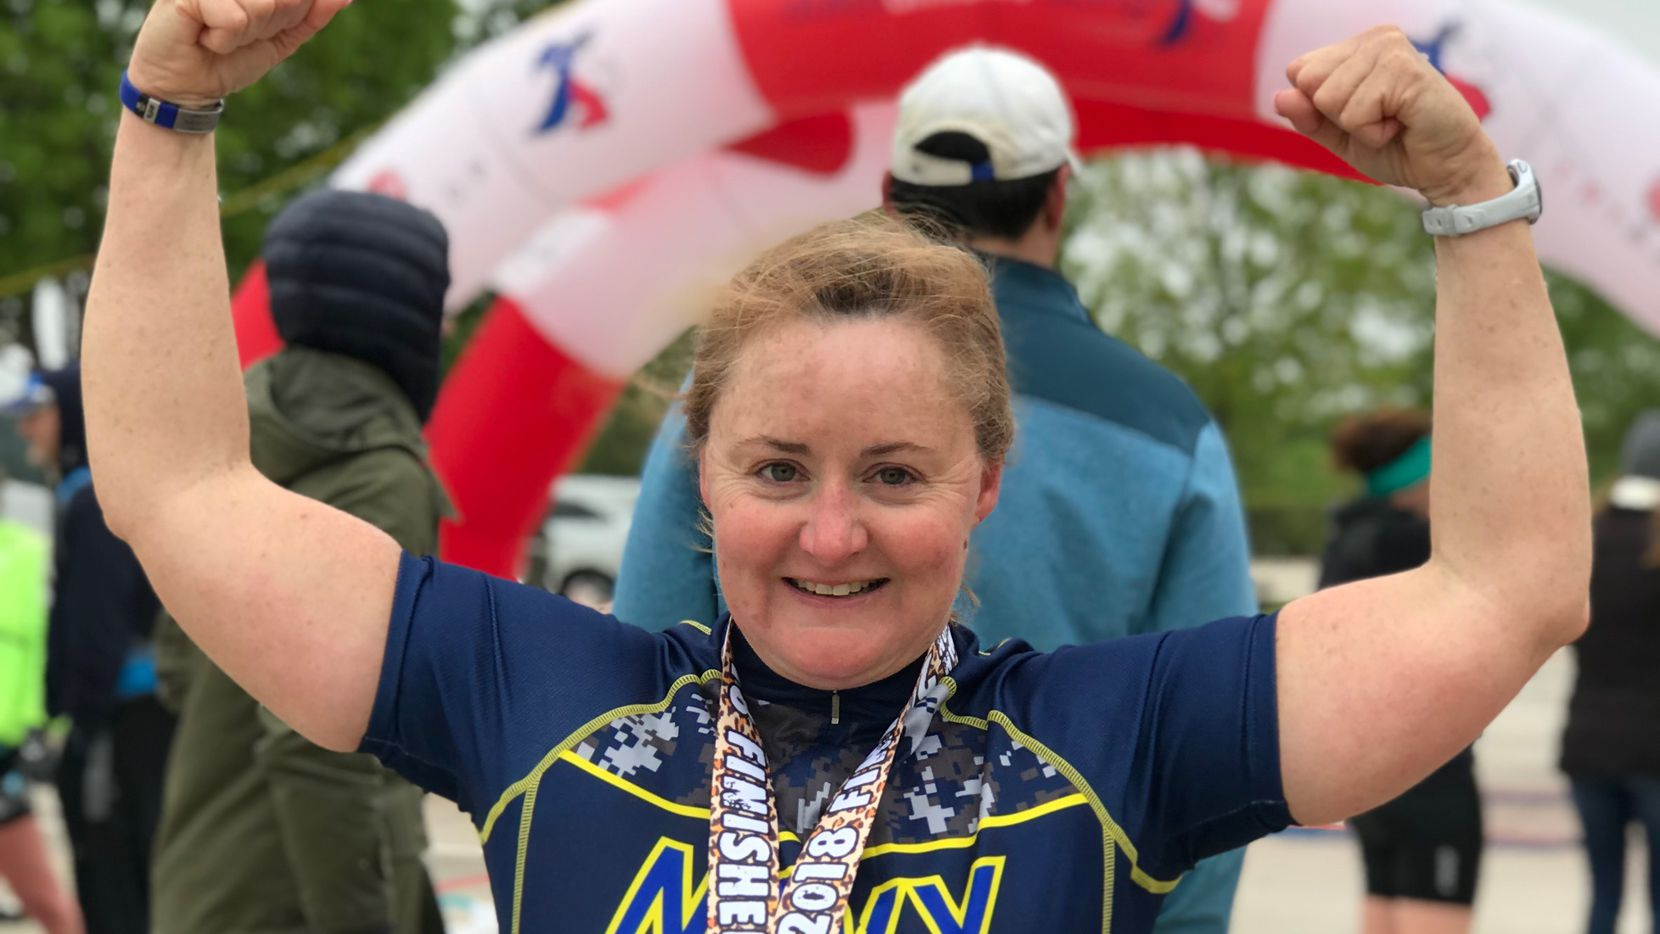 Emily Susan Law, 49, celebrates after a triathlon in April 2018.